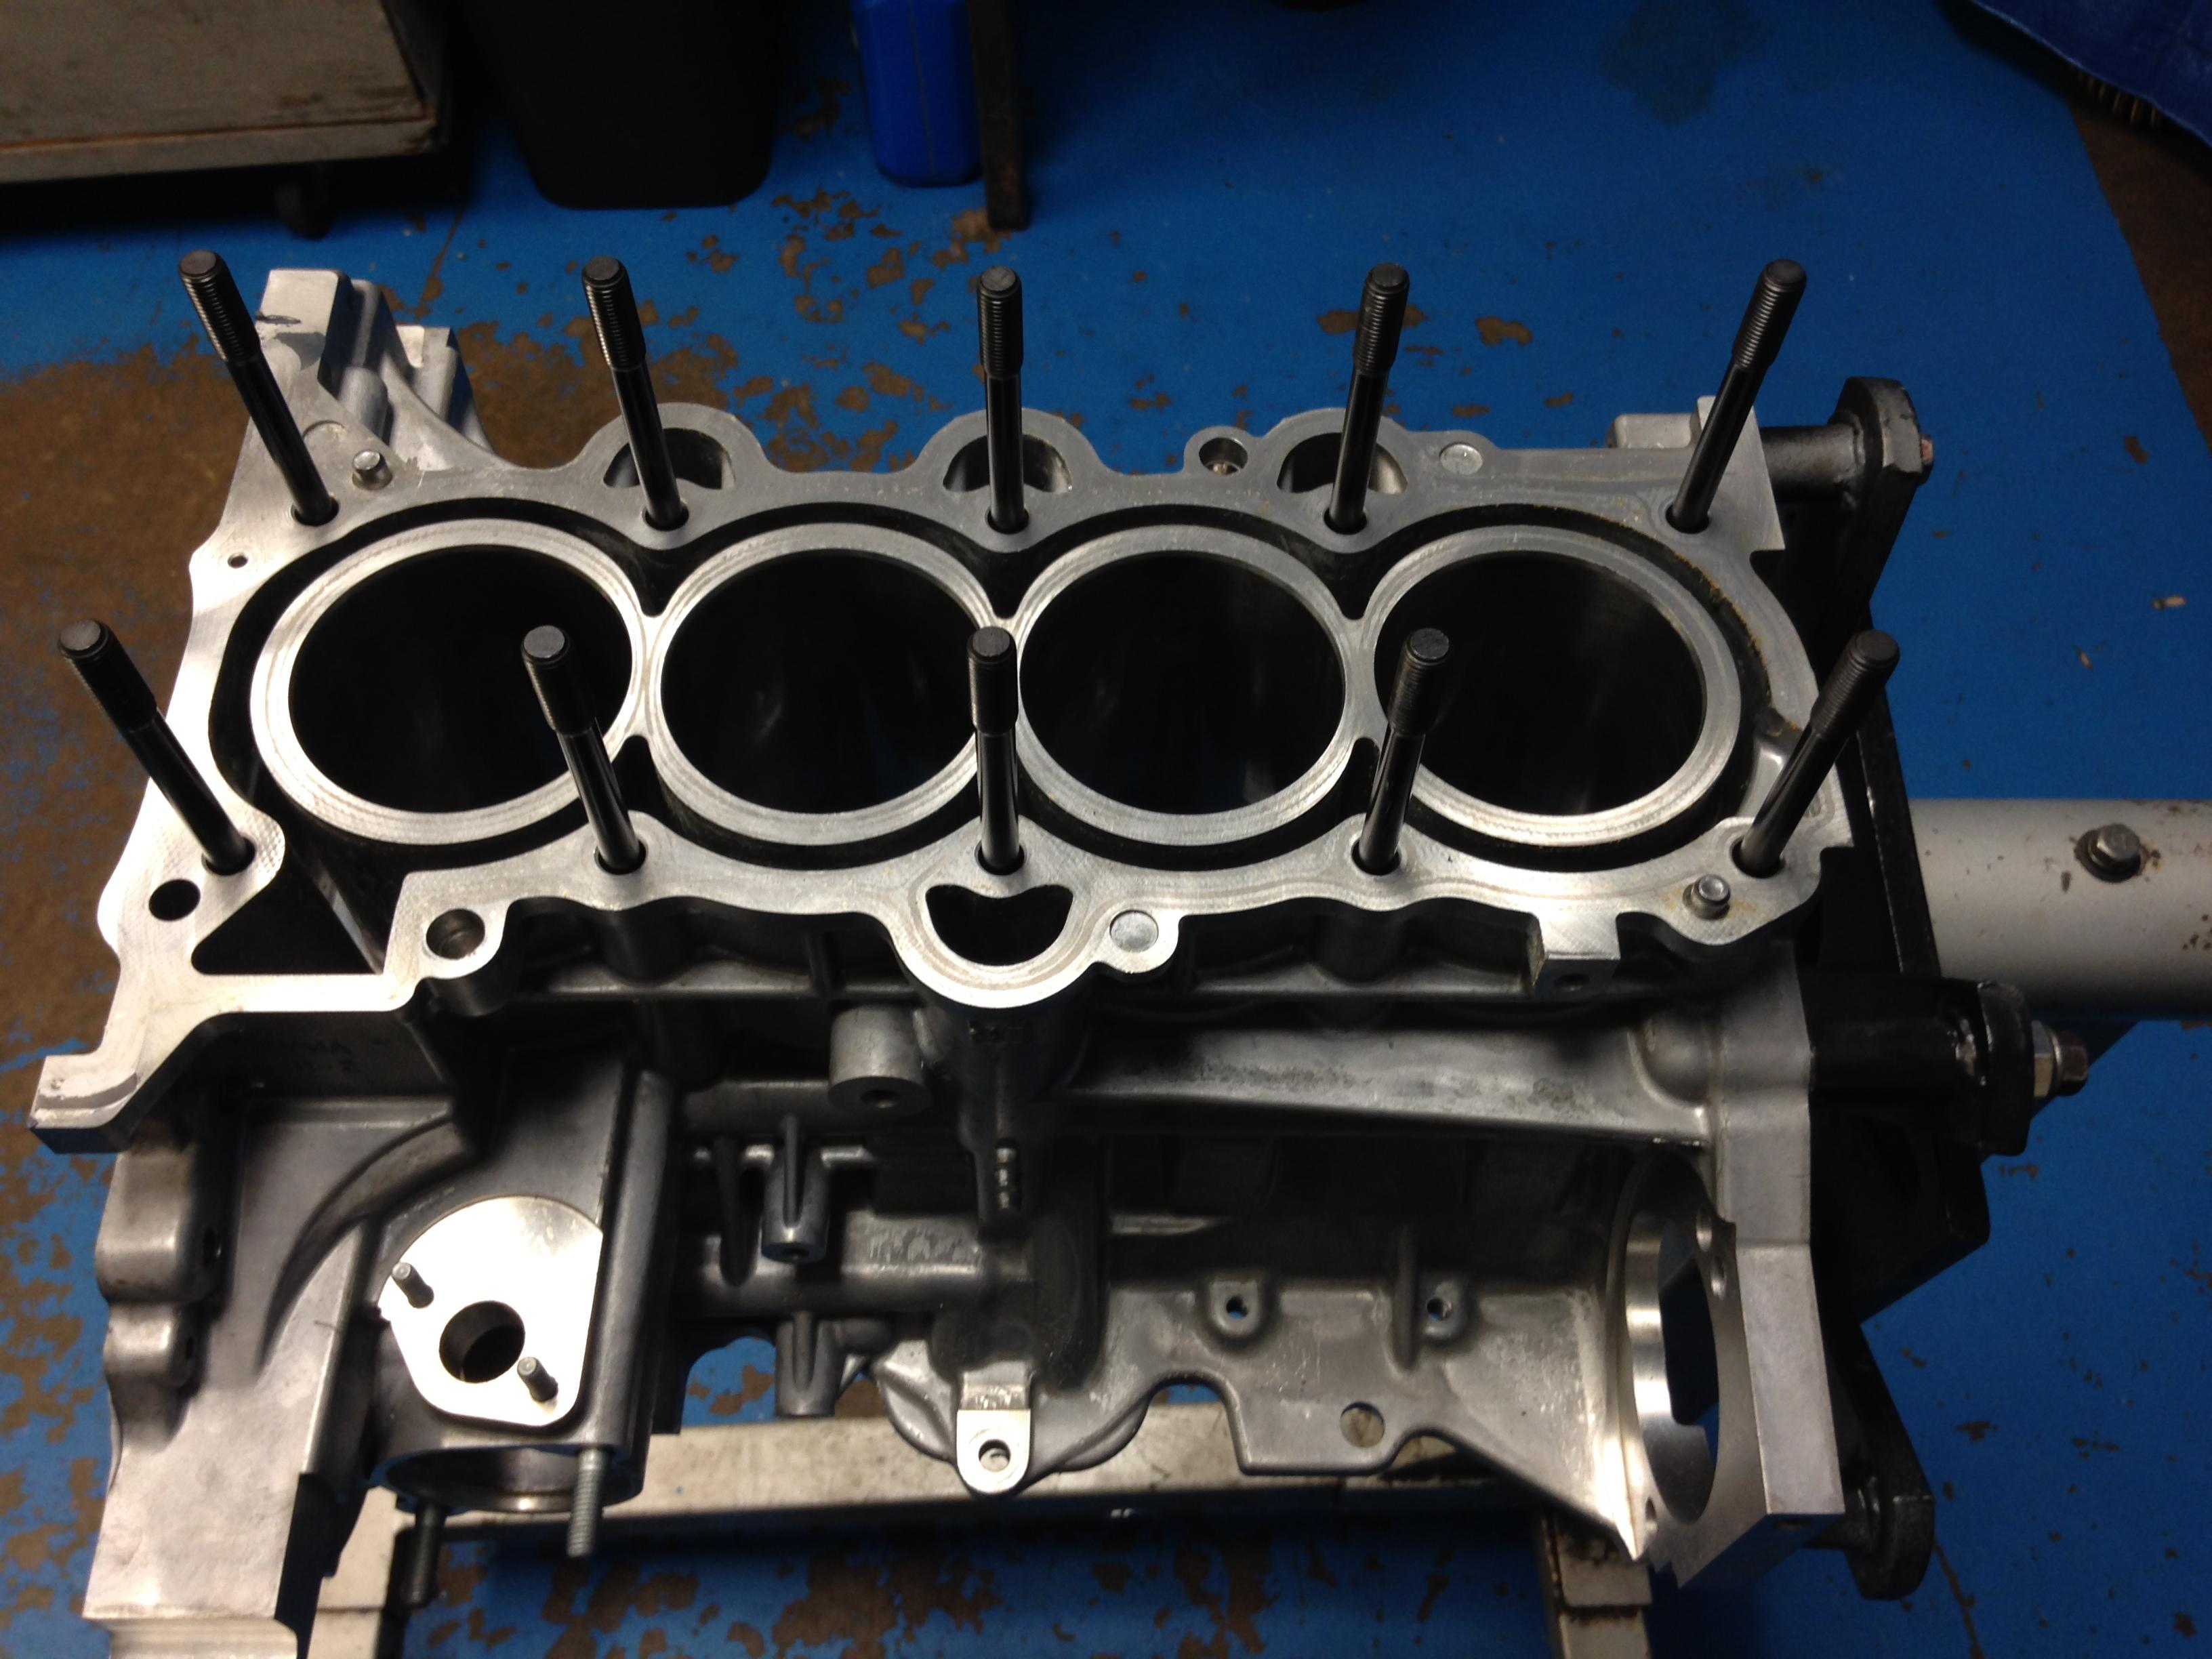 SEMA 2015 Hyundai Veloster Turbo Engine Build for Blood Type Racing